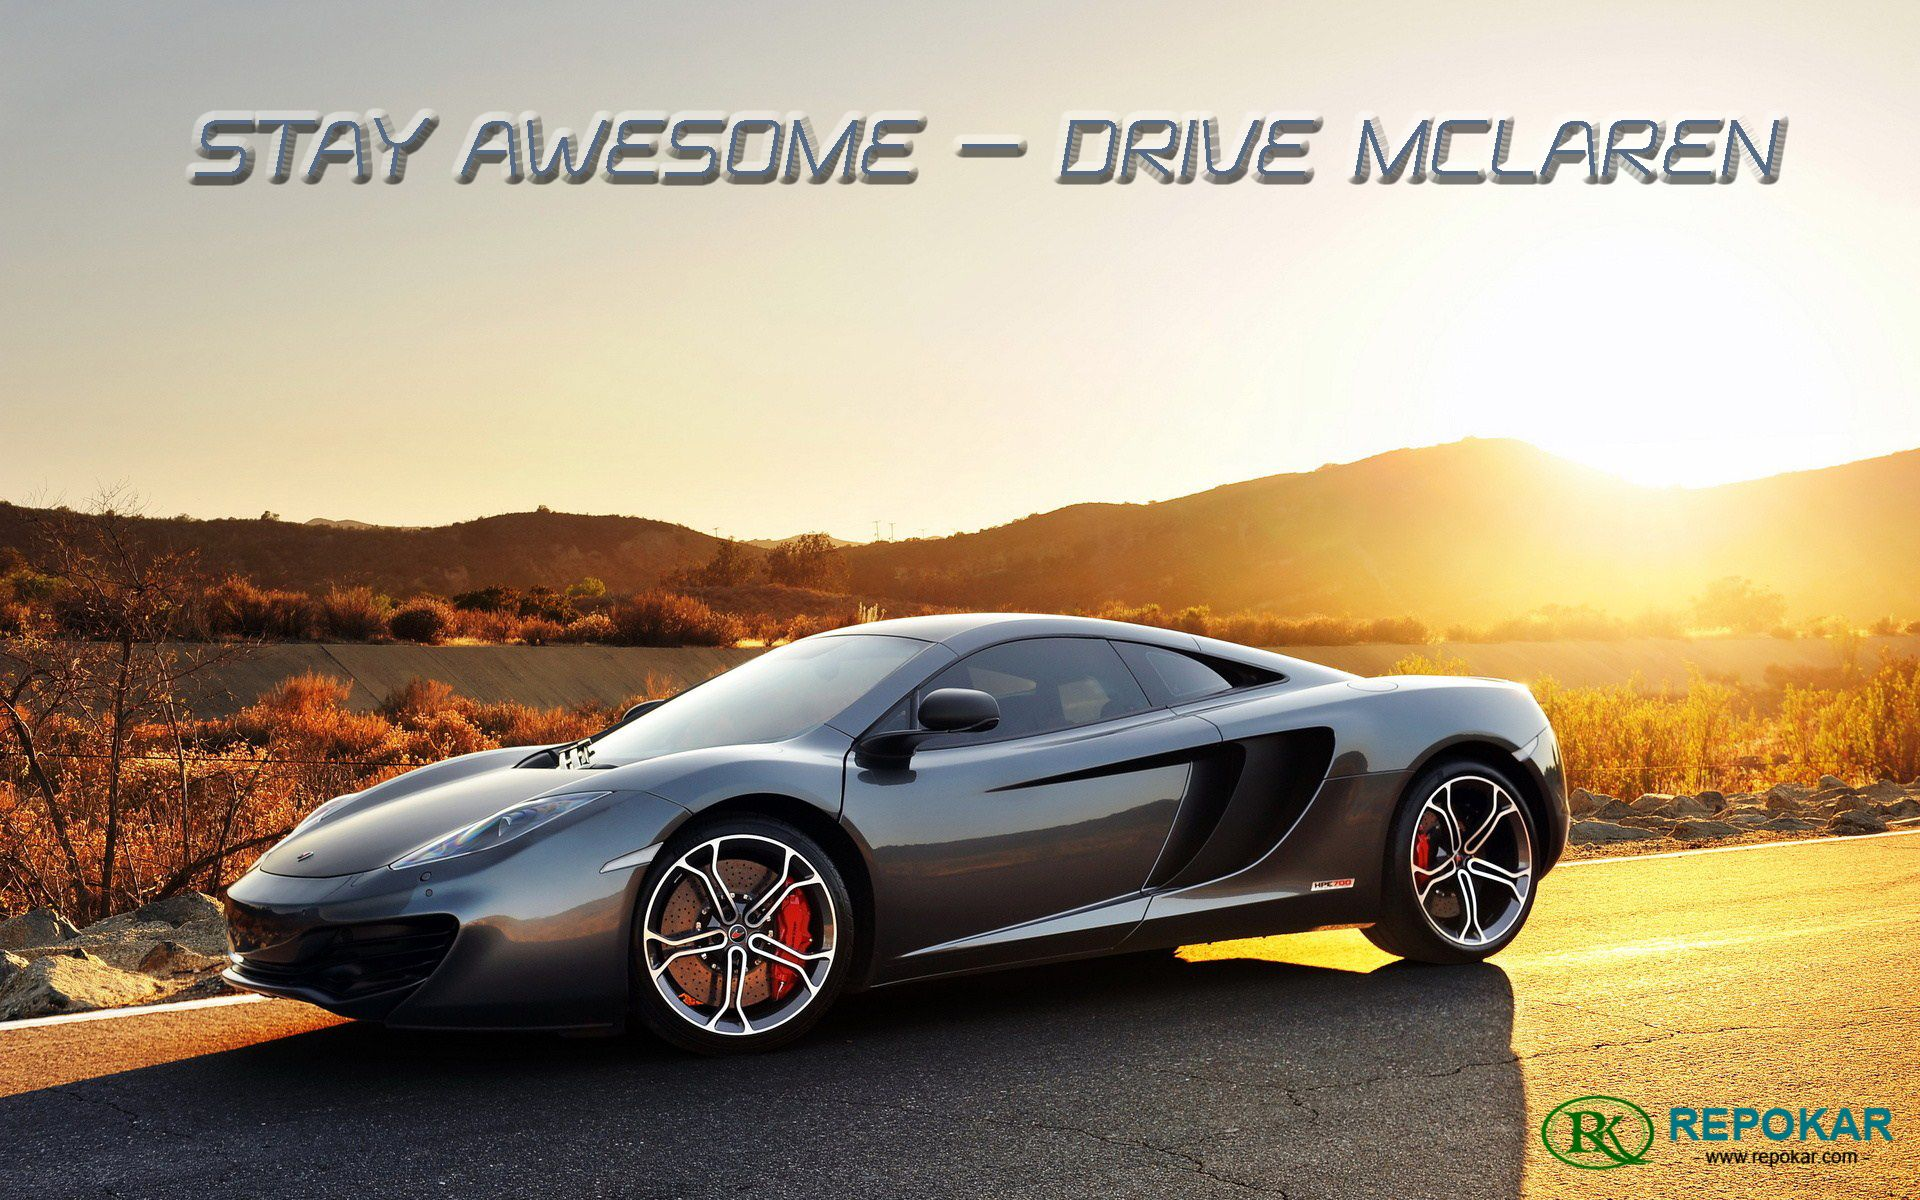 www.repokar.com Auto Auction - Our large car inventory makes us a ...